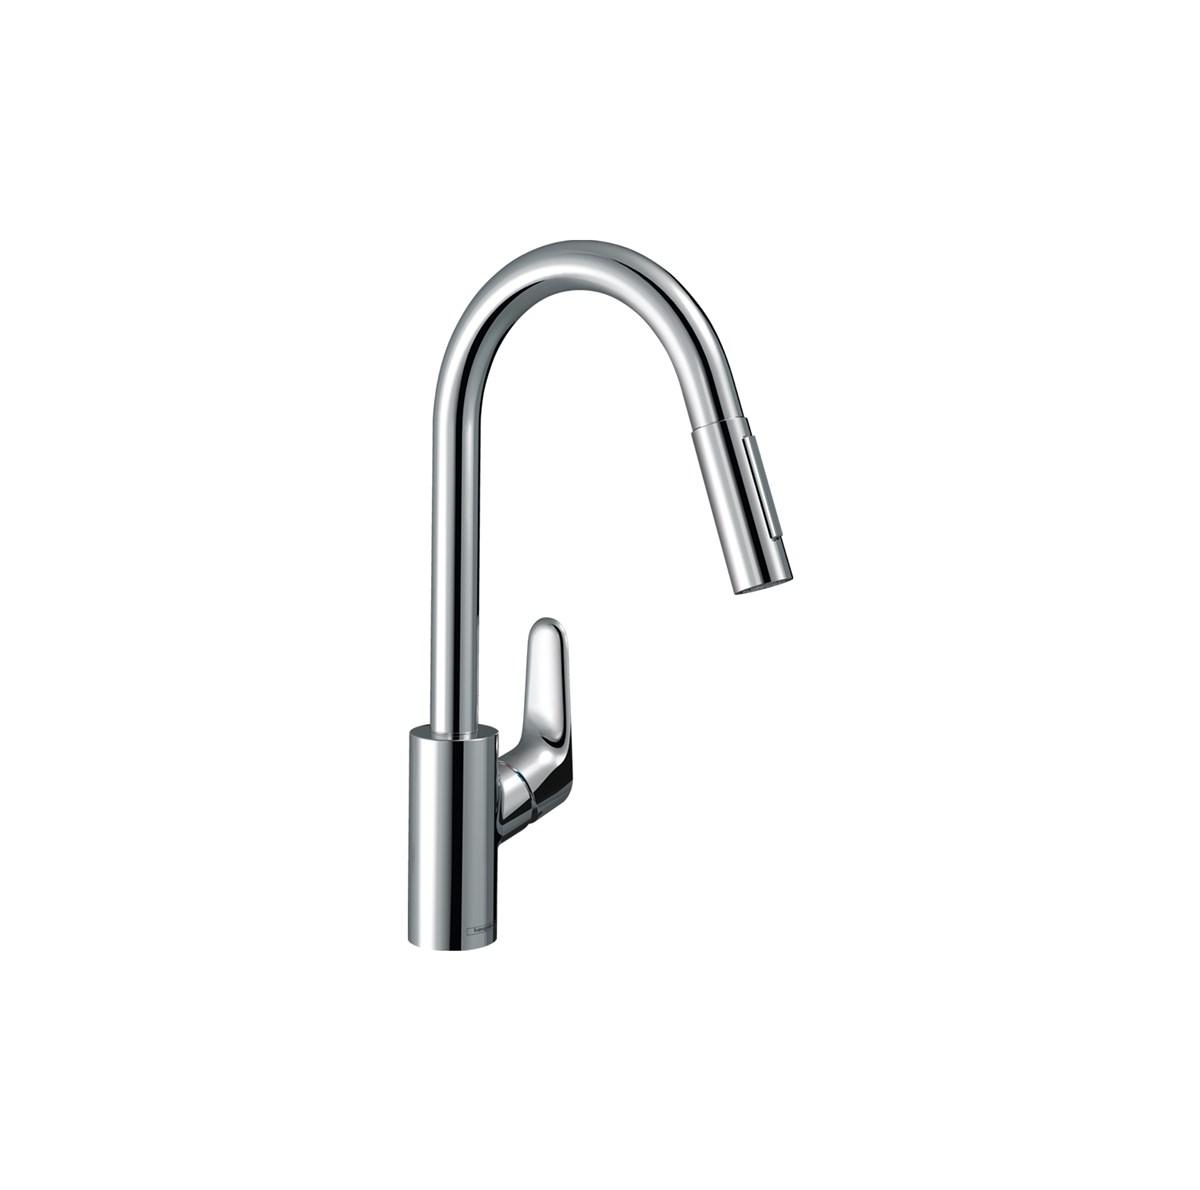 Hansgrohe-Focus-M41-Kitchen-Mixer-240-73880000-Matisse-1